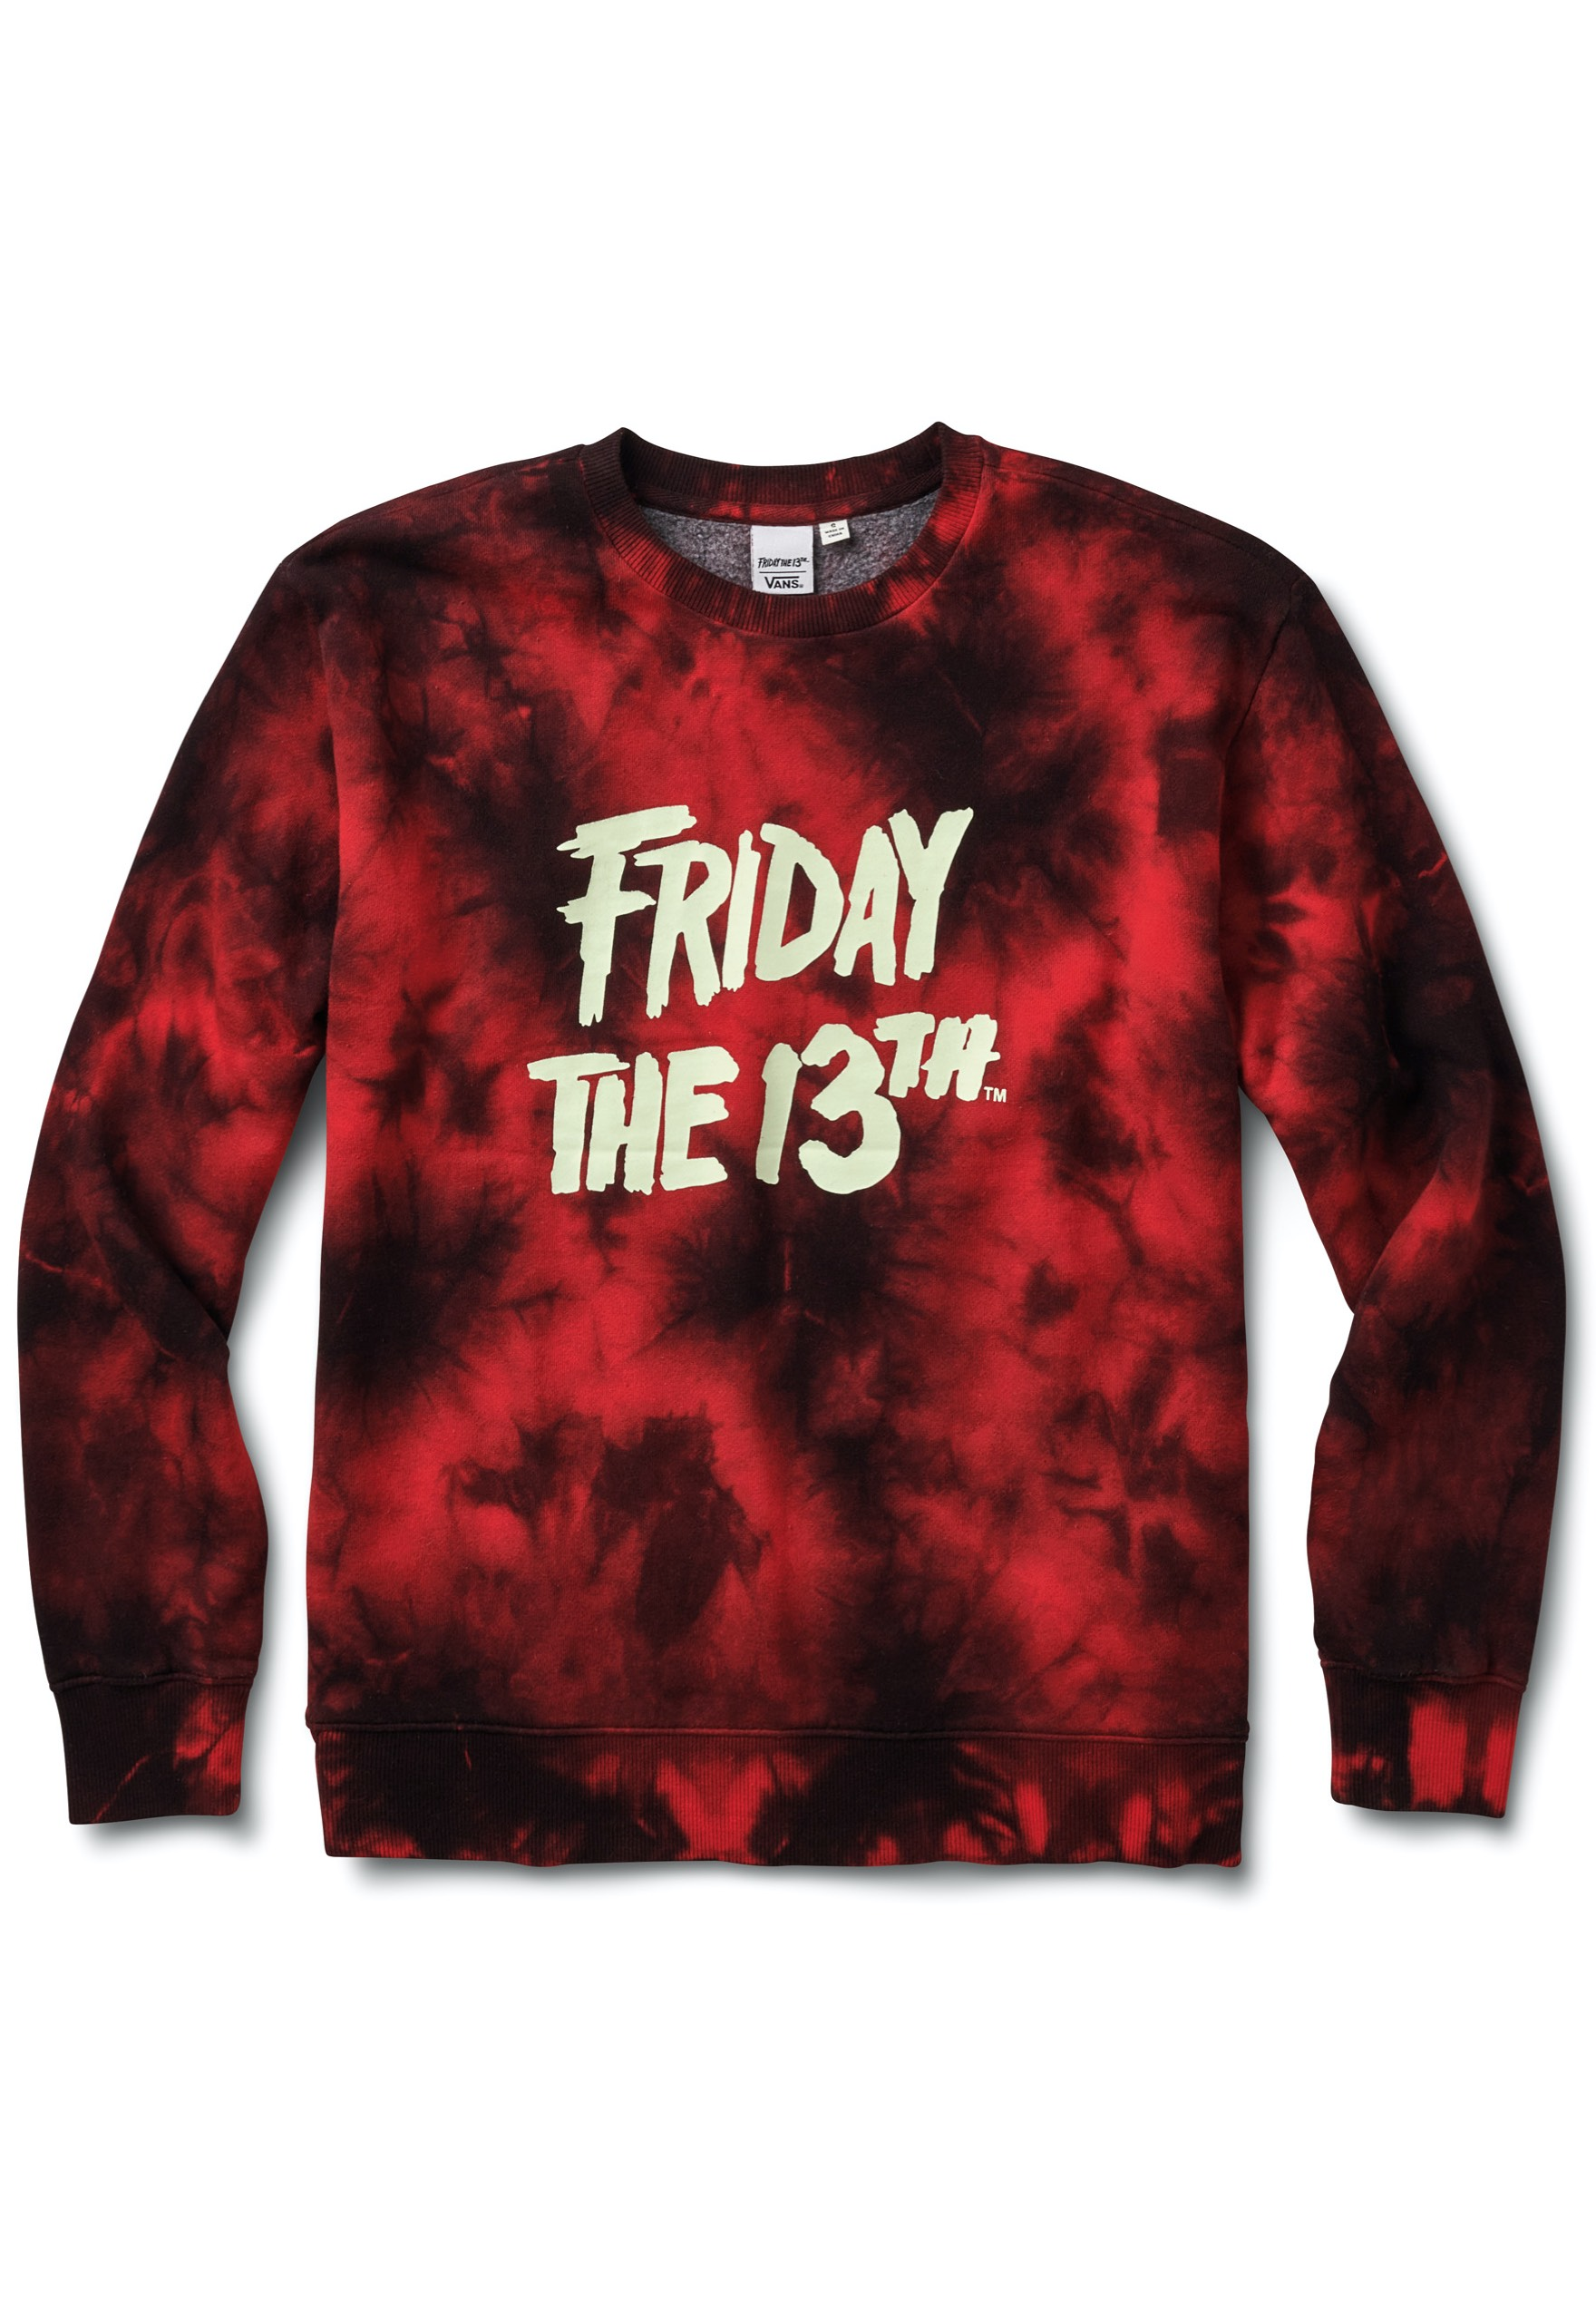 Vans x Horror Friday 13Th Sweater